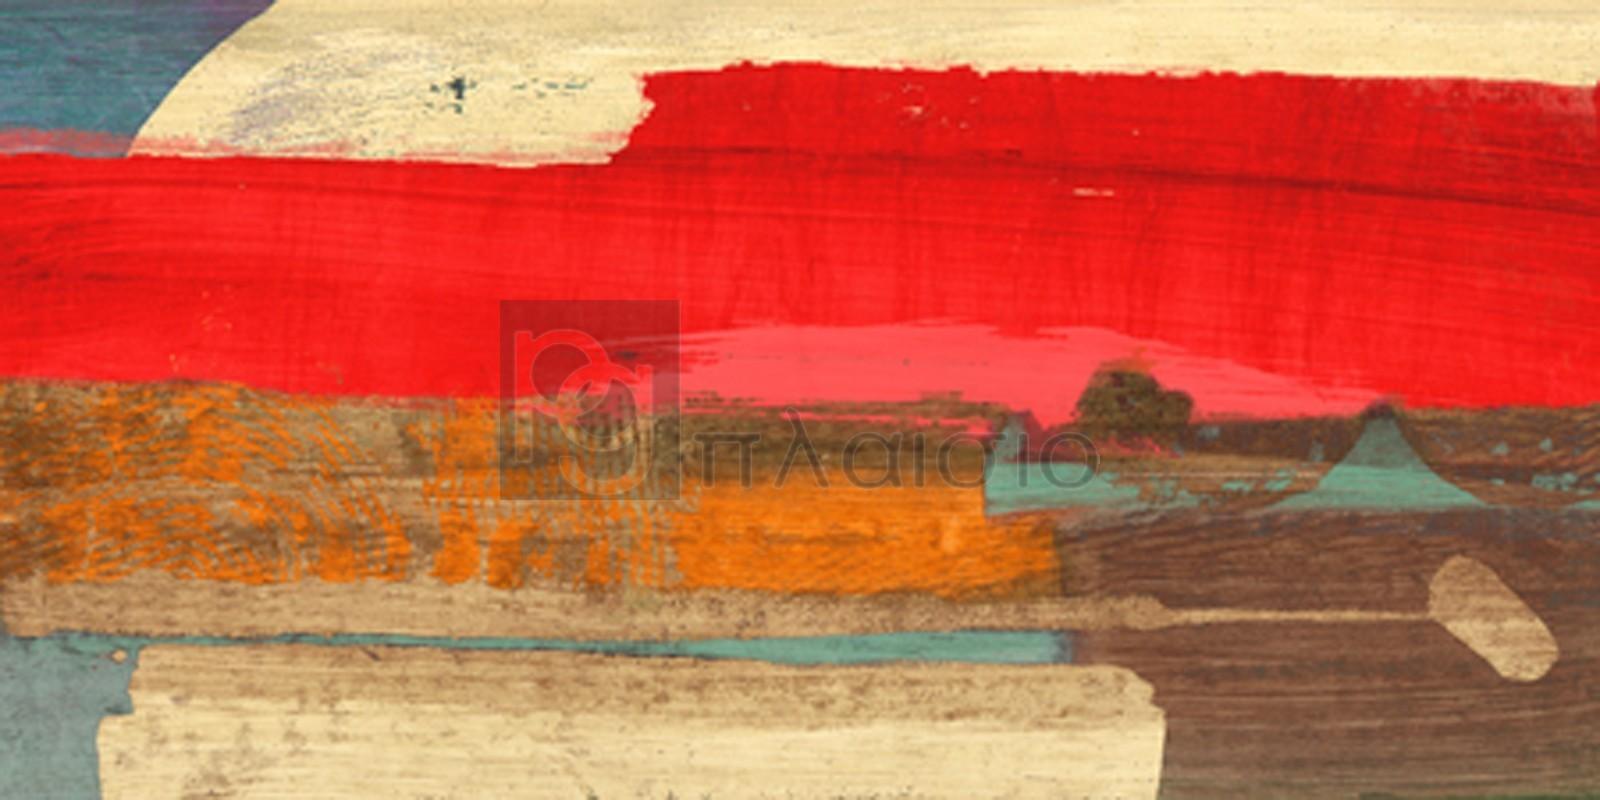 Leonardo Bacci - Moon Rising from the Crimson Sky